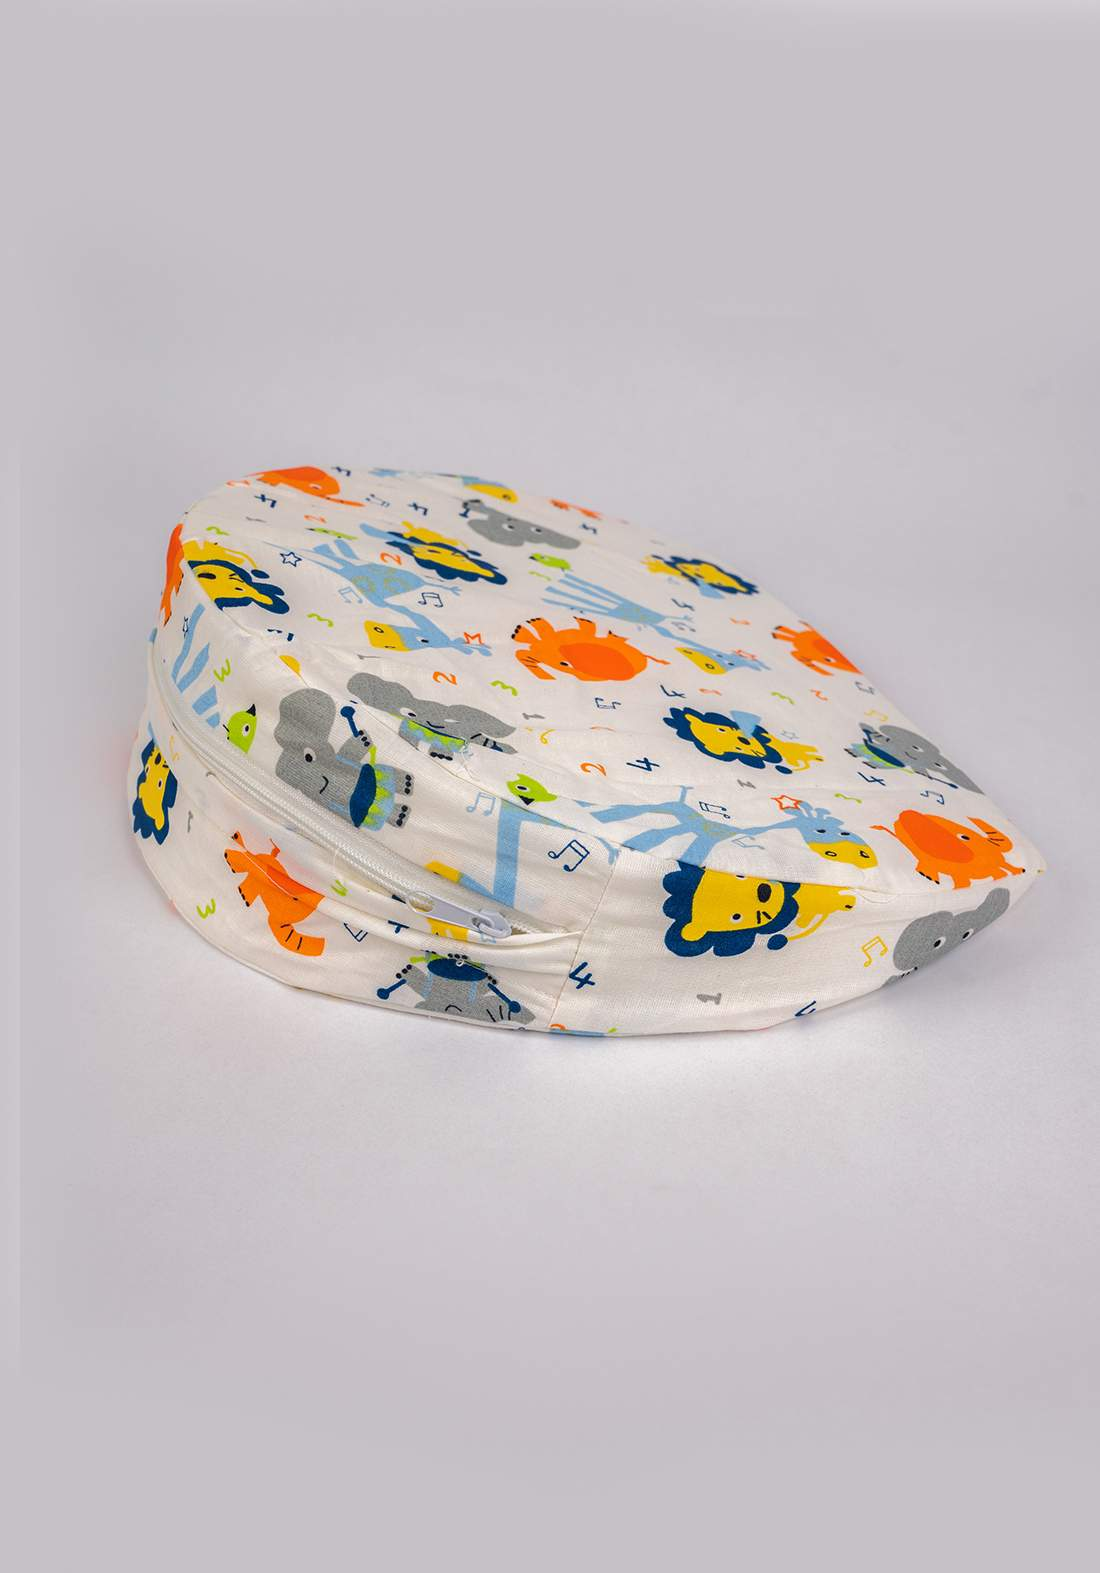 KD Group Pregnant Belly Support Pillow وسادة دعم للحامل